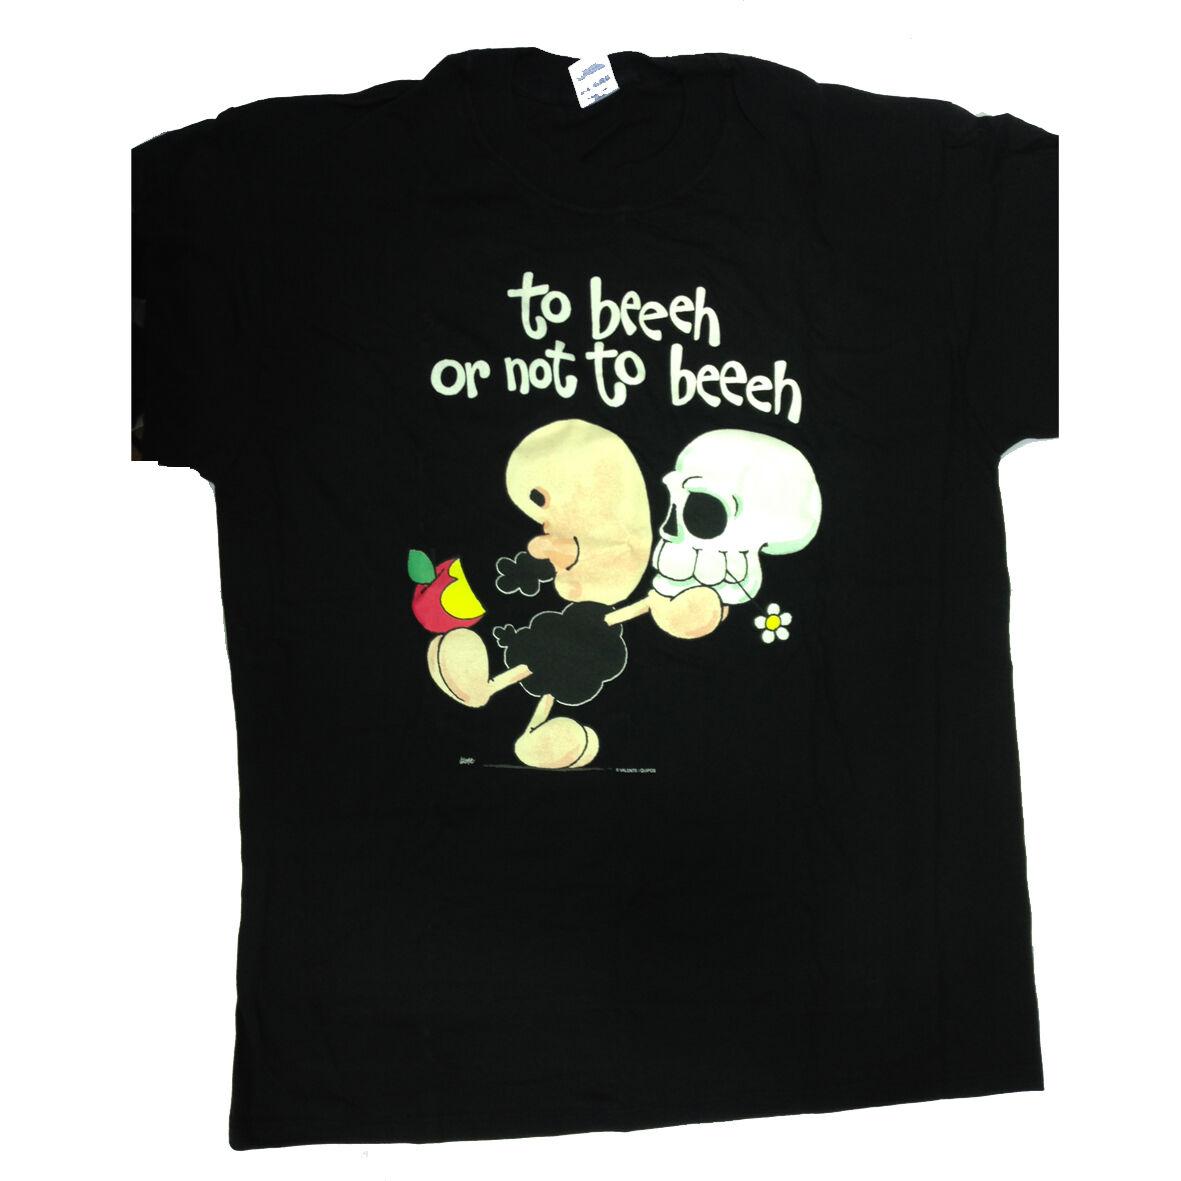 T-shirt umoristiche PECORA NERA 100% cotone nera TO BEEEH OR NOT TO BEEH